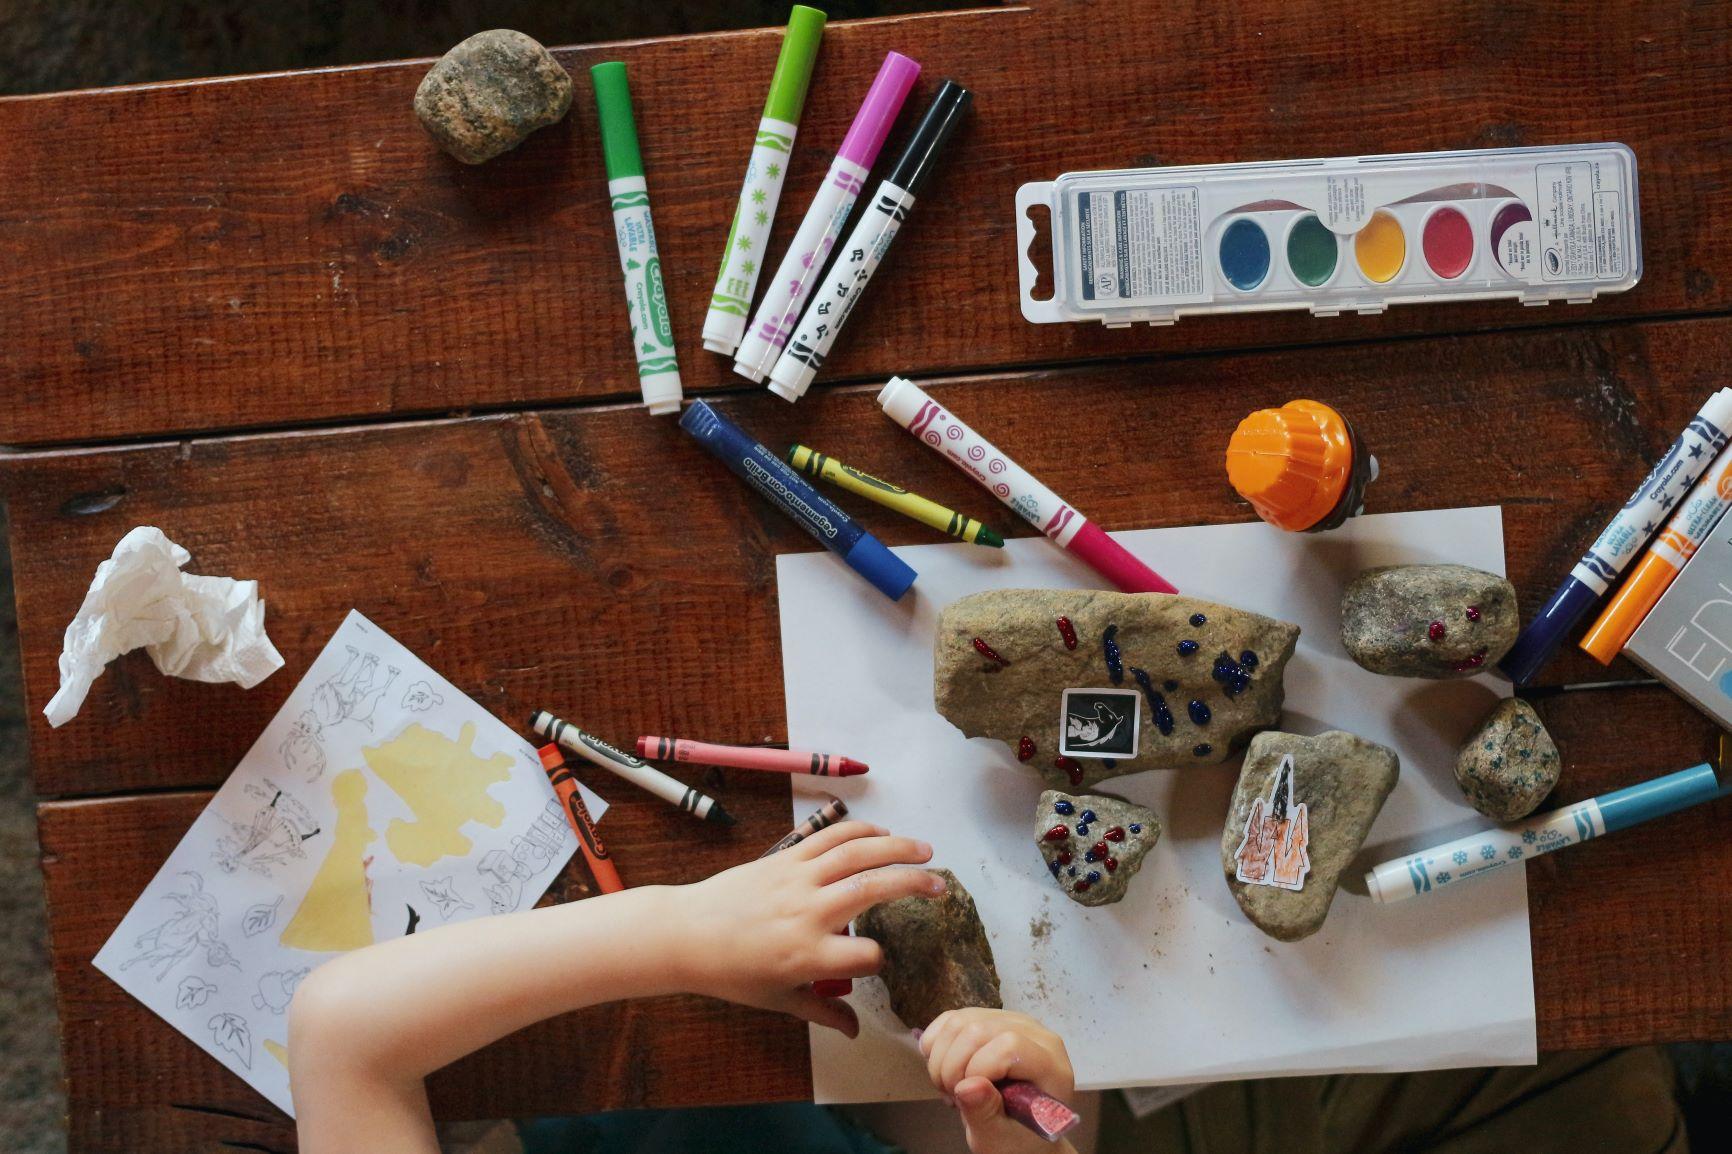 Child at Heart: Στο Golden Hall τα ψώνια γίνονται η πιο ευχάριστη στιγμή για μικρούς και μεγάλους